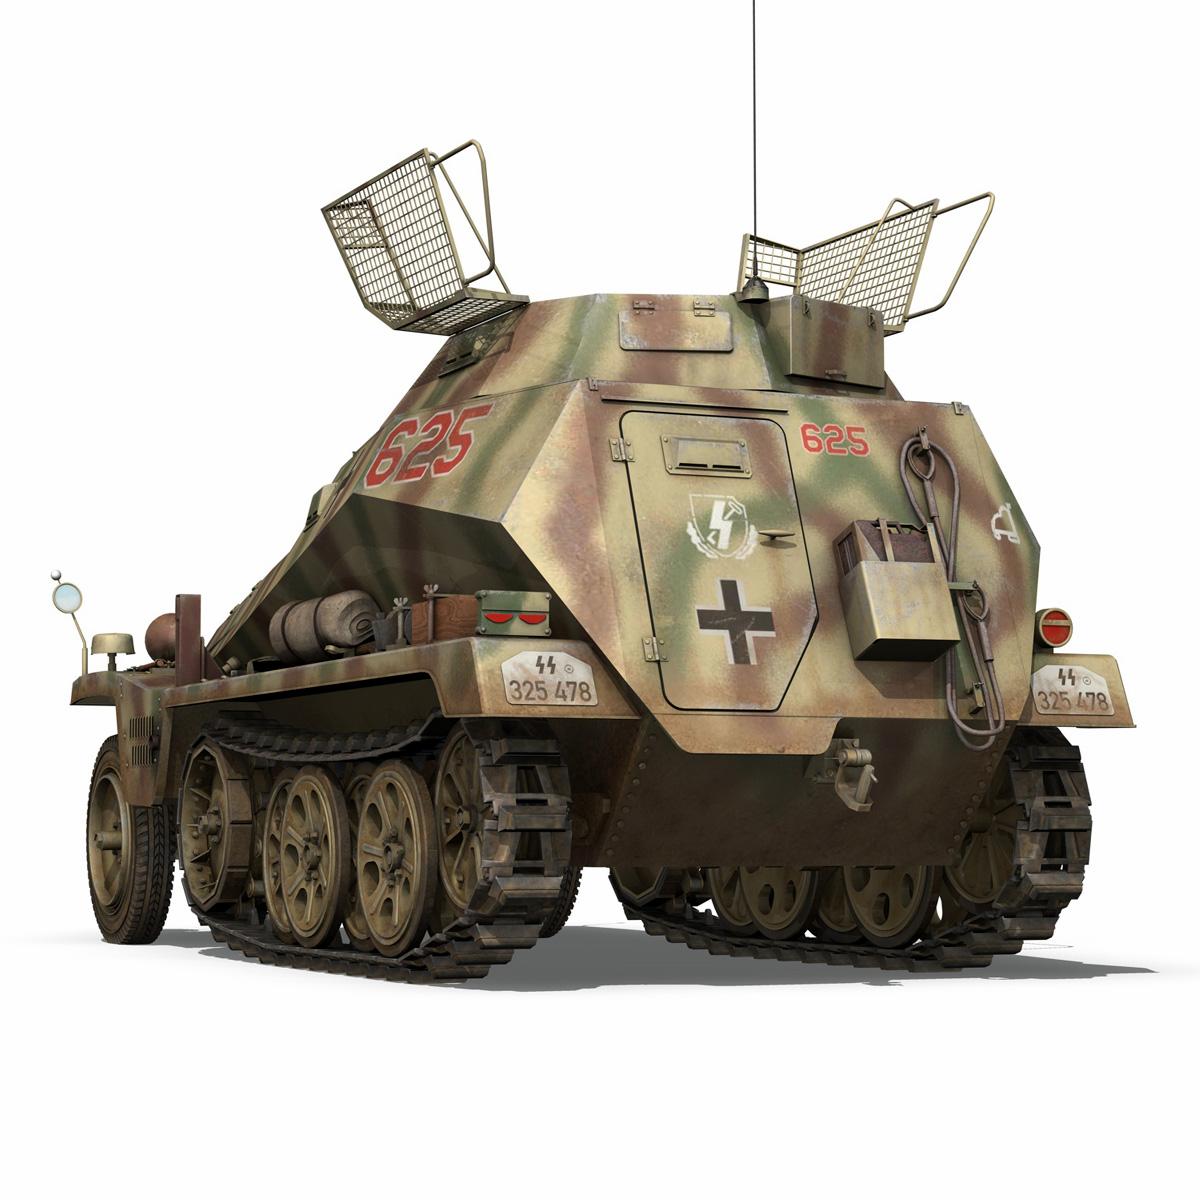 sd.kfz 250 9 – half-track armored vehicle 3d model 3ds fbx c4d lwo obj 198216